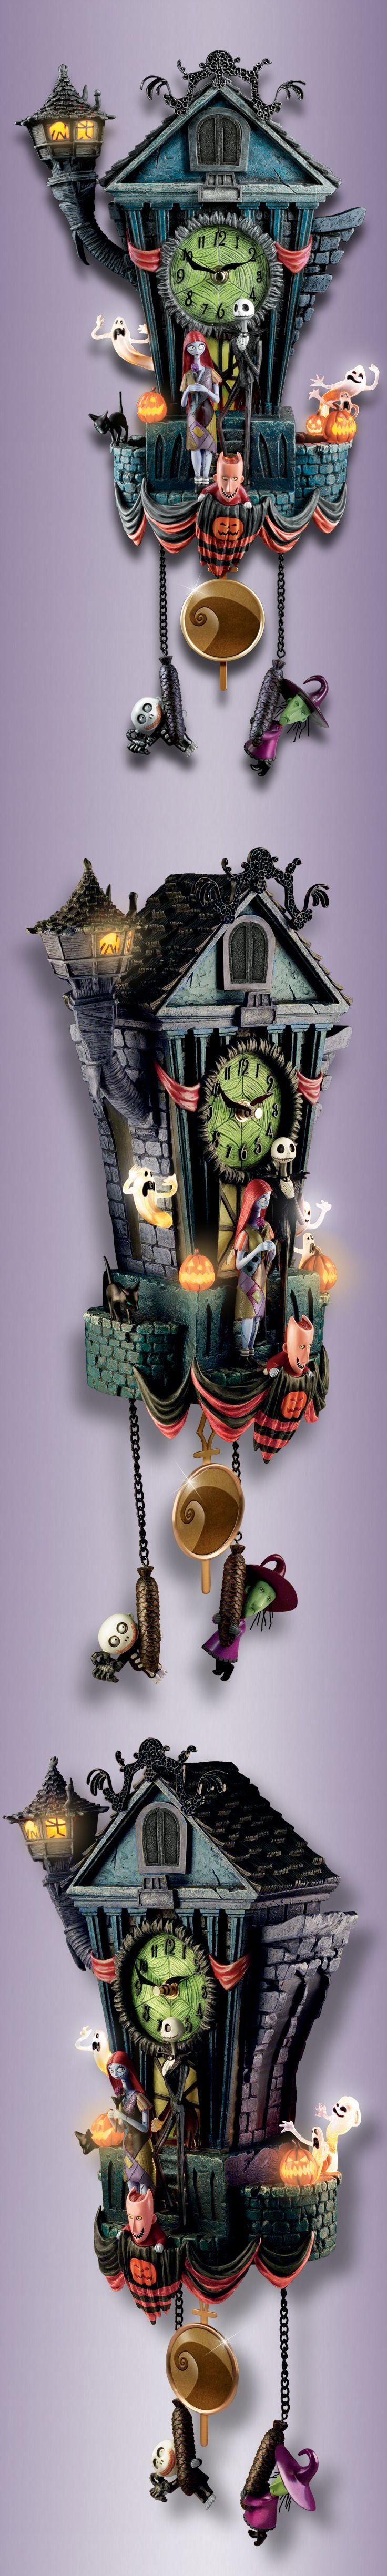 the nightmare before christmas cuckoo clock cuckoo clocks - Nightmare Before Christmas Cuckoo Clock